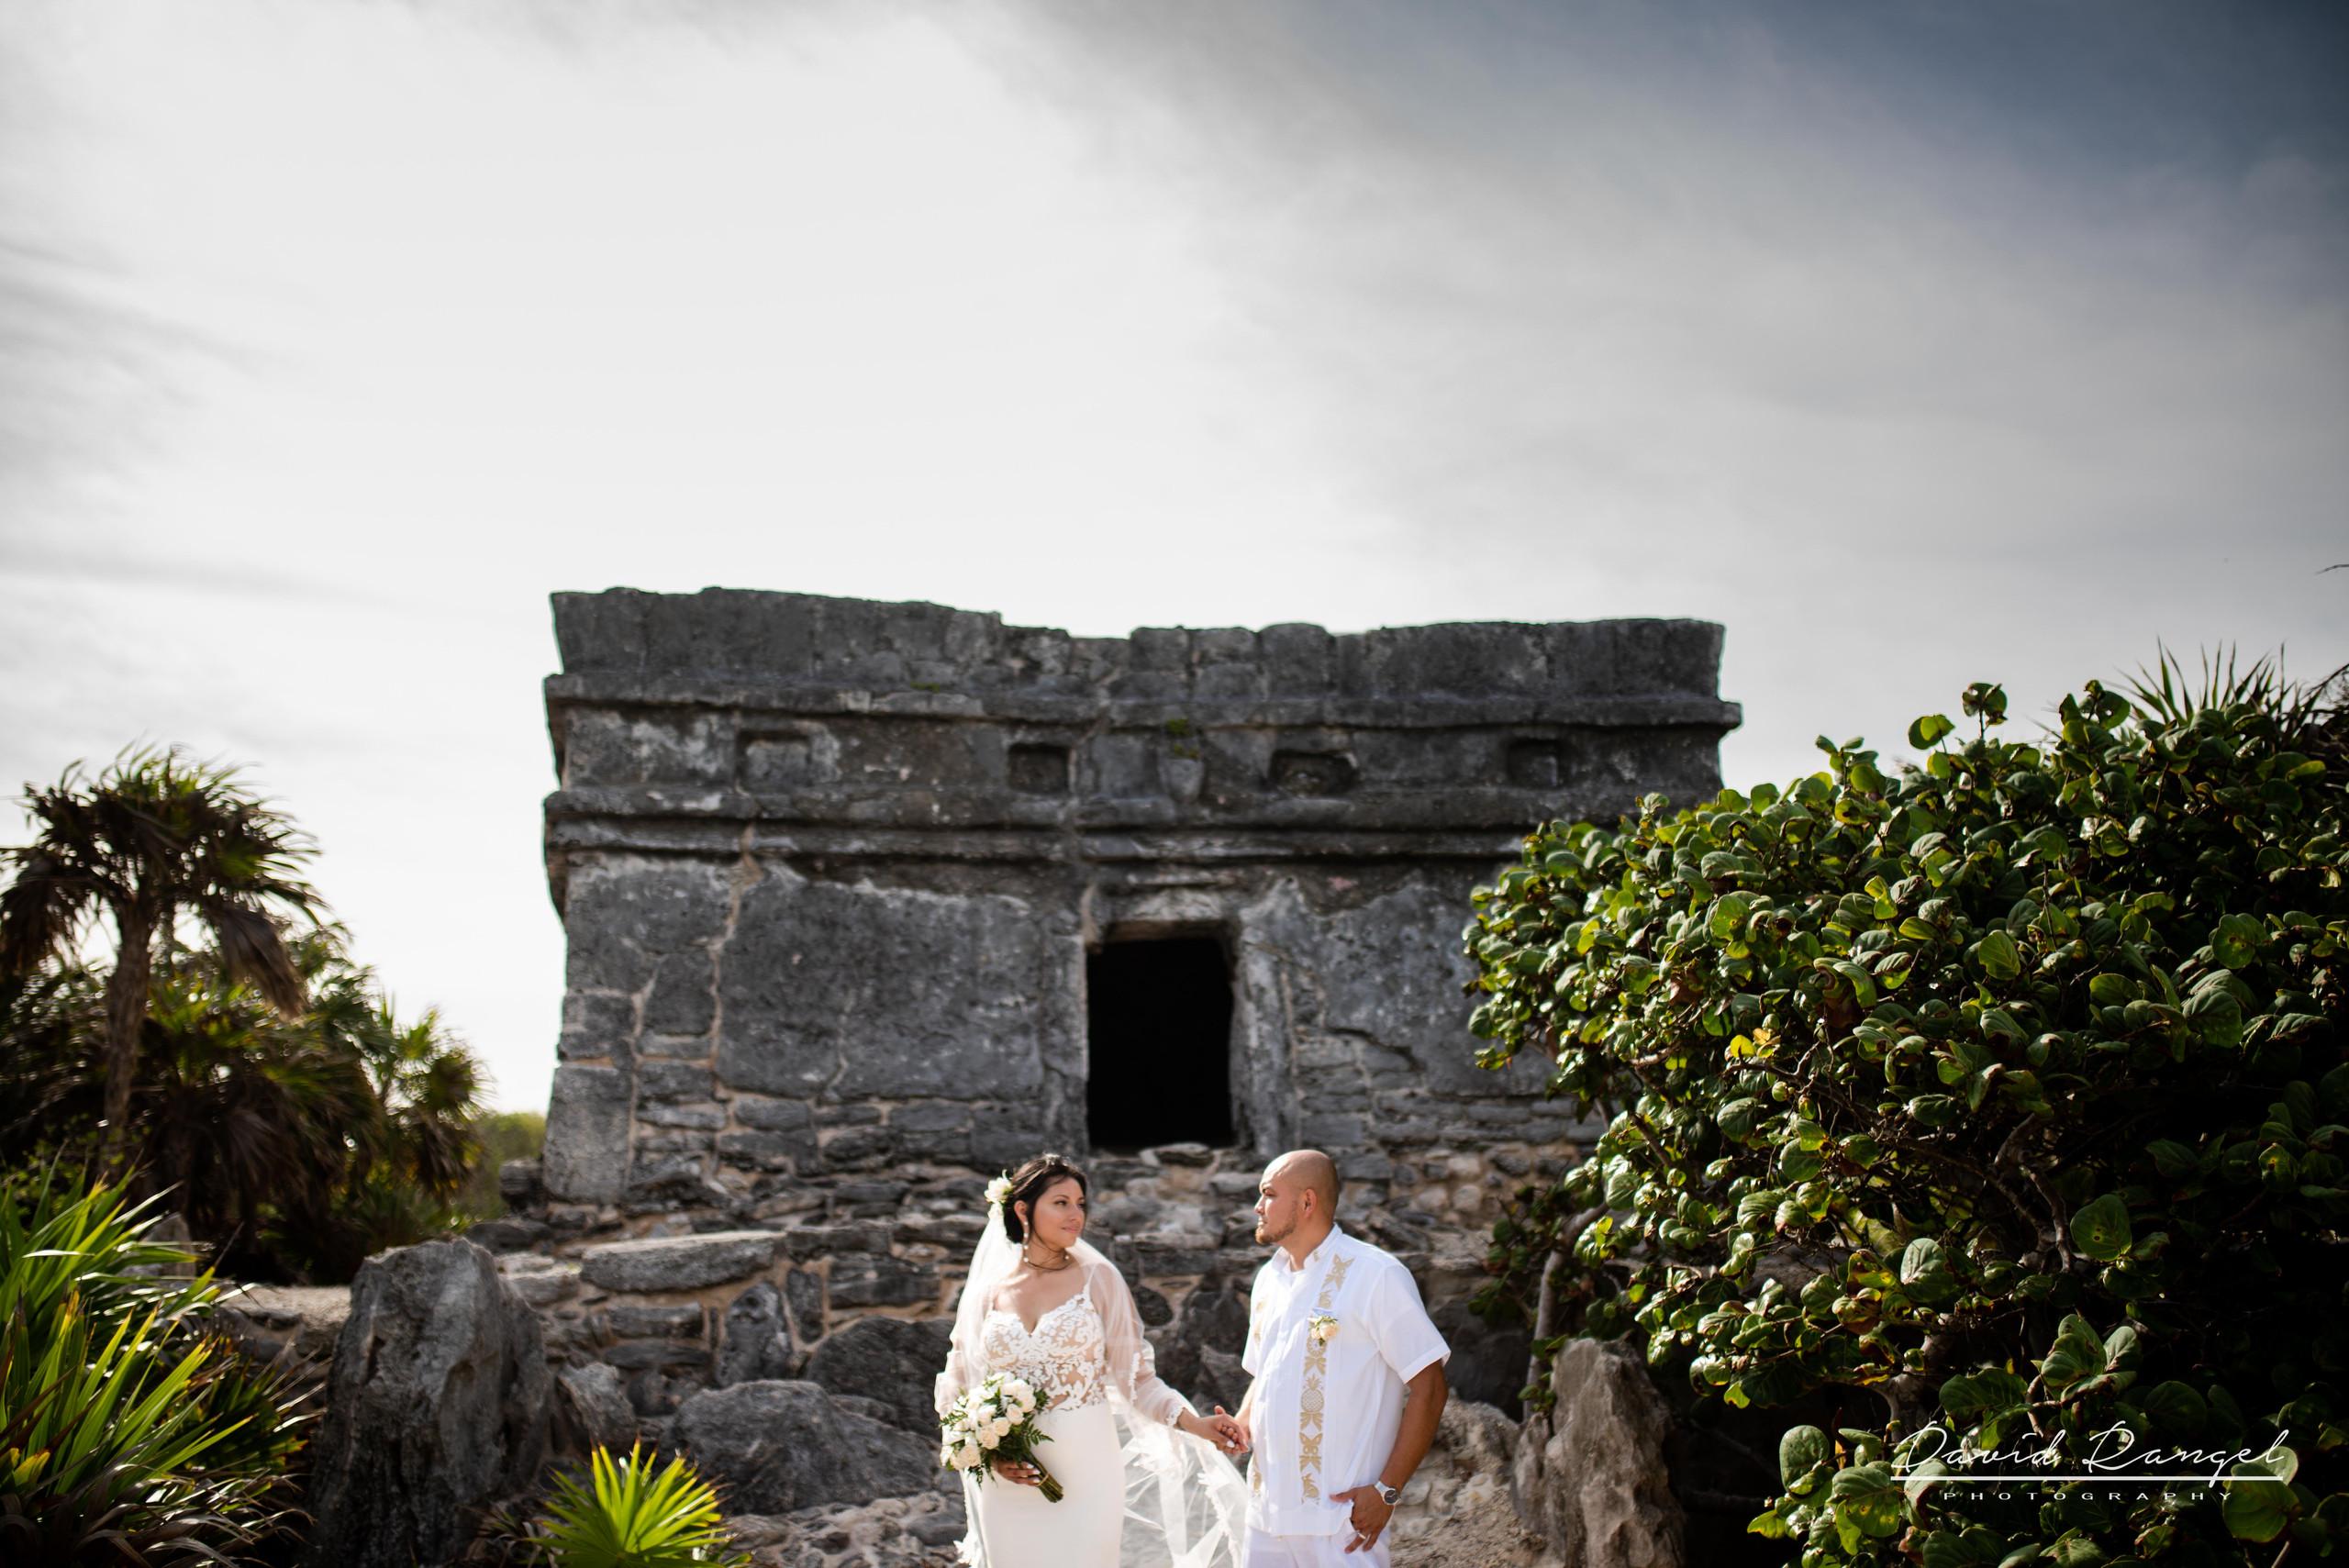 bride+groom+rocks+beach+riviera+maya+palm+trees+wedding+coverage+photo+bouquet+love+union+celebration+nature+caribean+sea+mayan+ruins